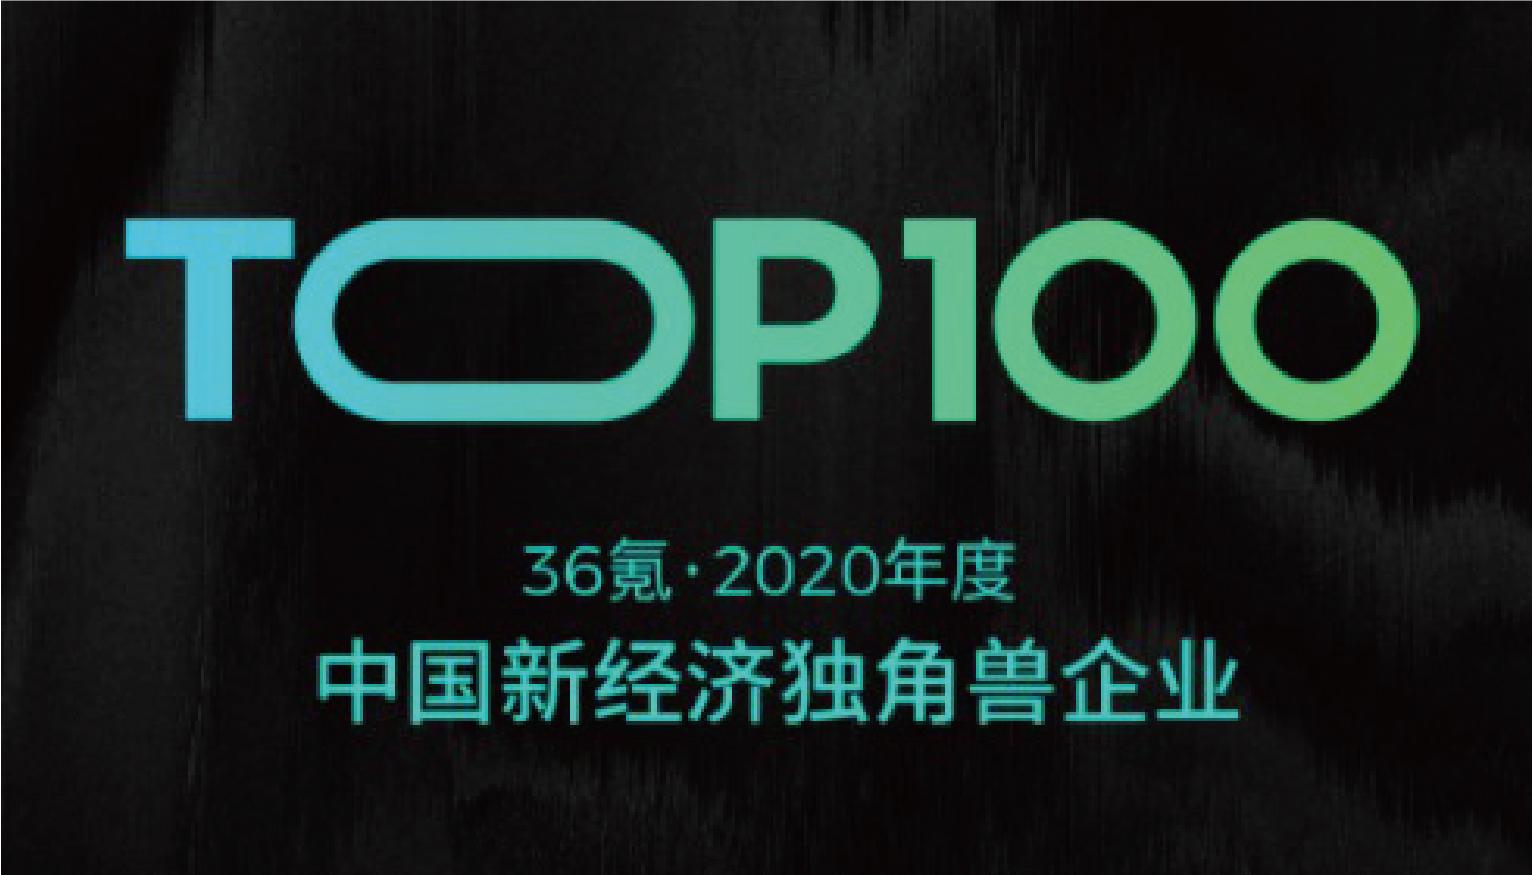 AMR(自律搬送ロボット)業界で唯一のノミネート</br>日本No.1シェアのギークプラス、36krが発表する</br>中国ユニコーン企業トップ100に選出!